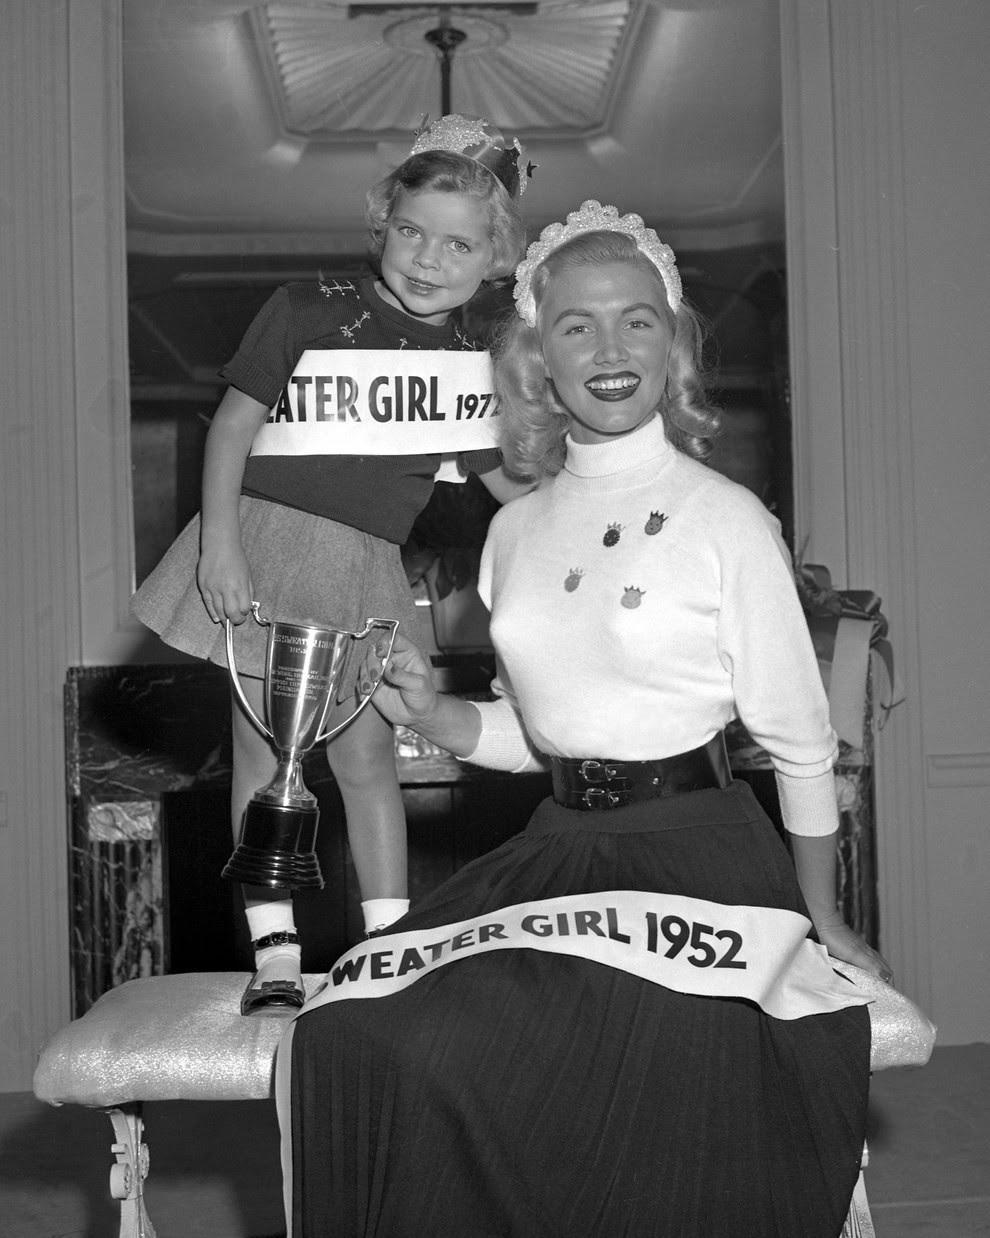 4. Королева Свитеров, 1952 конкурс, королева, красота